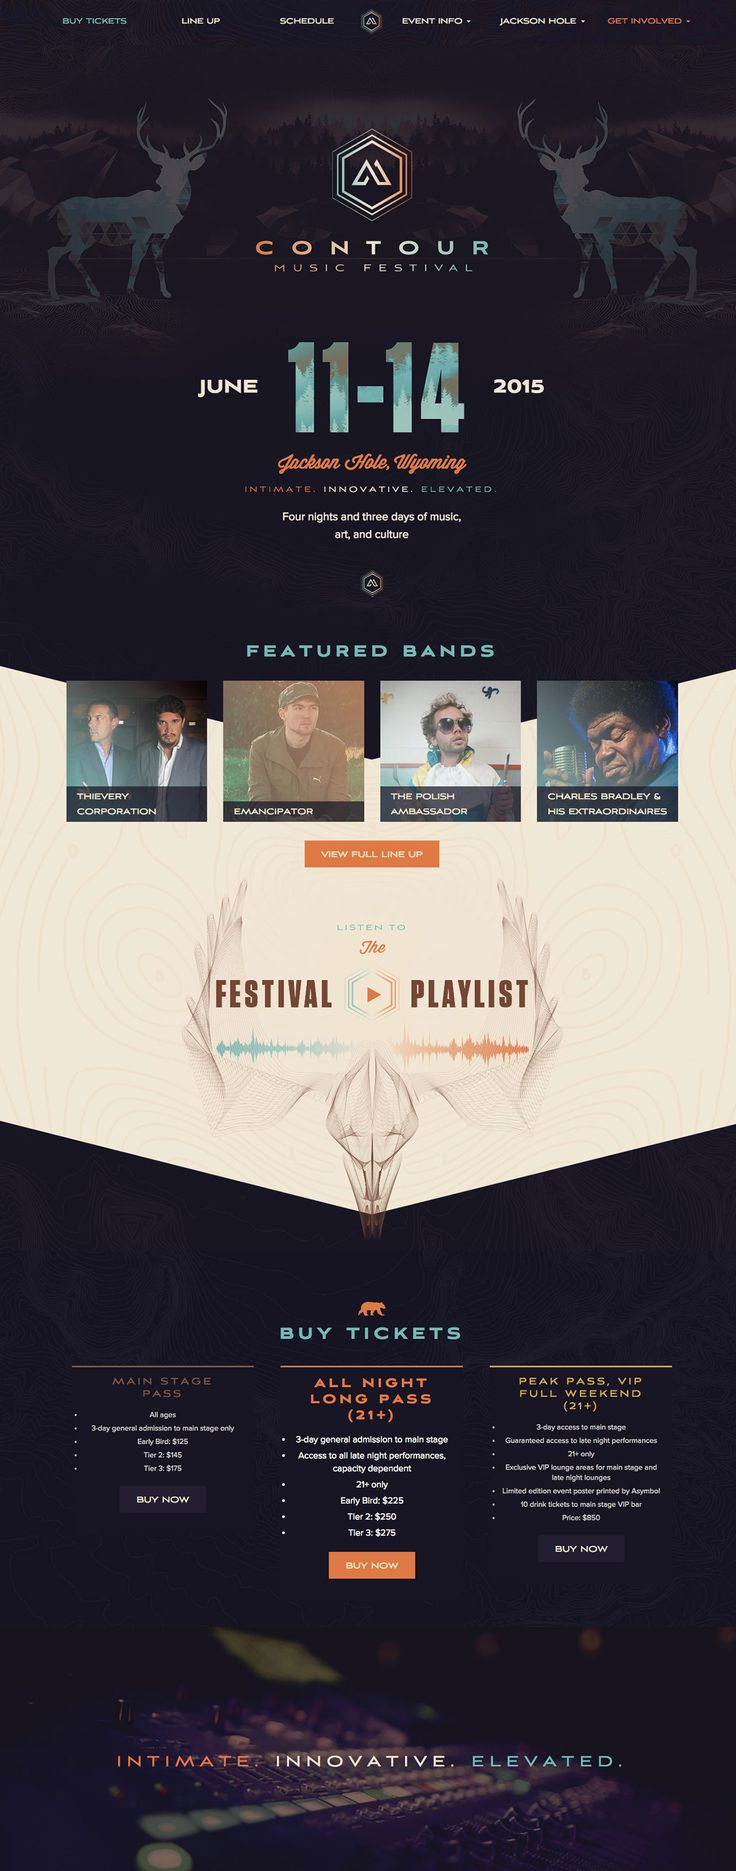 Contour Music Festival Tmbr Jackson Wyoming Wedding Websitemusic